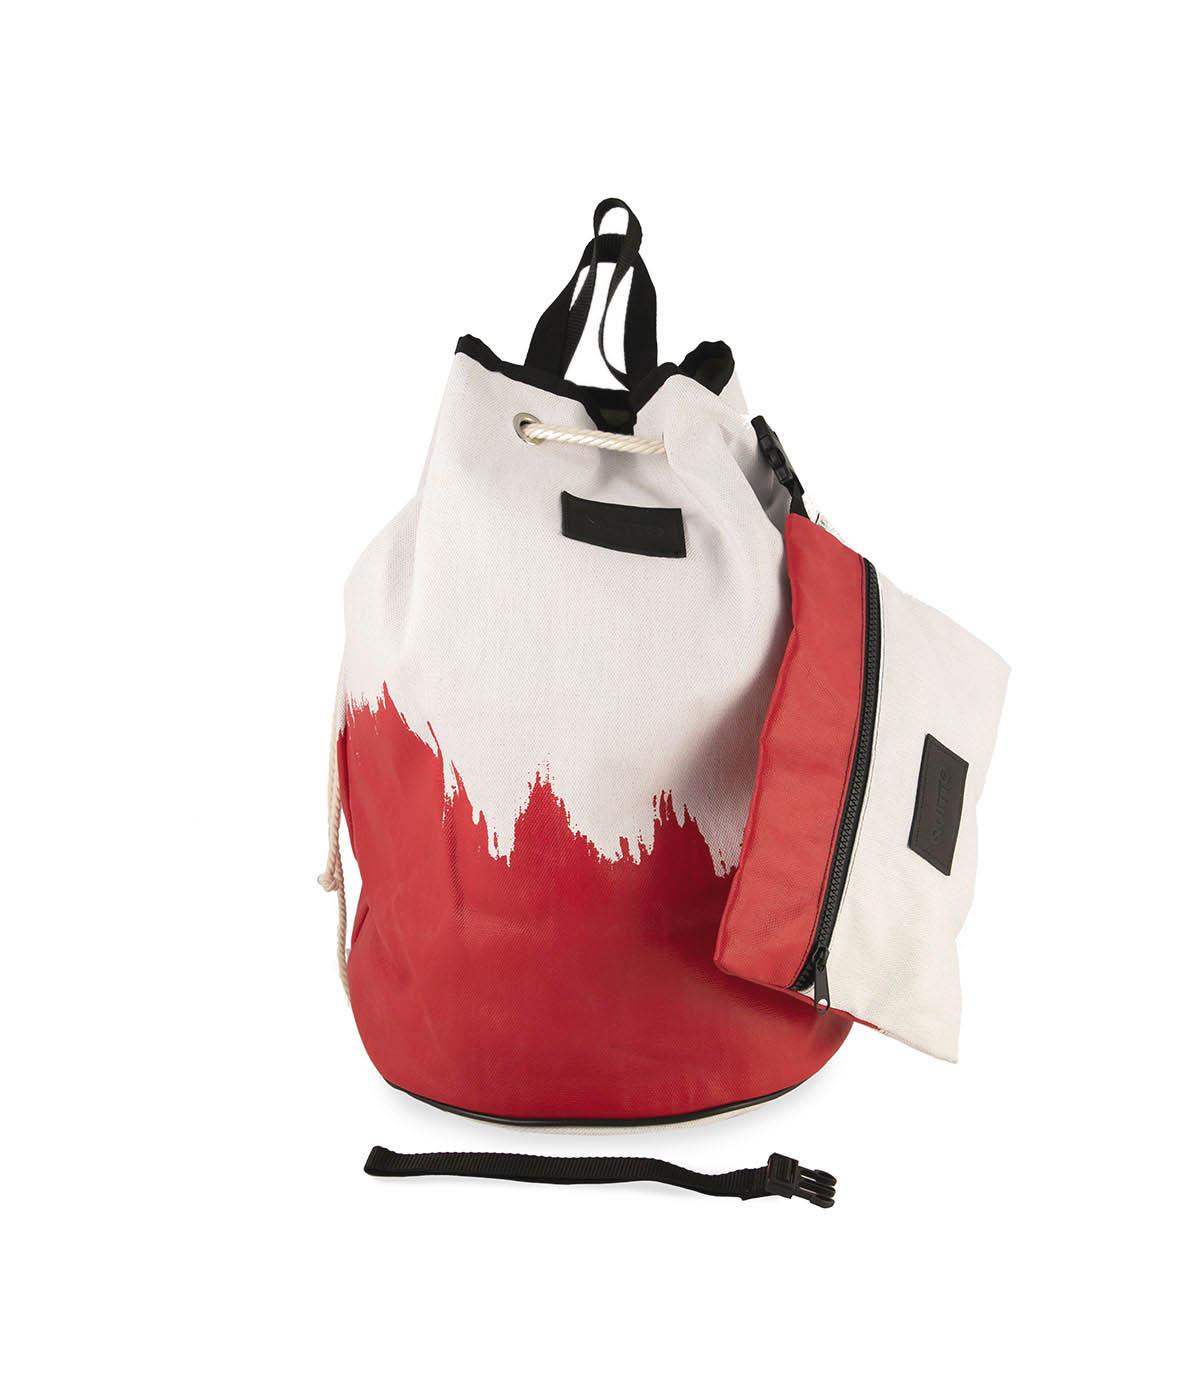 Sacca Tonda Impermeabile Bianca e Rossa Quitto Bags